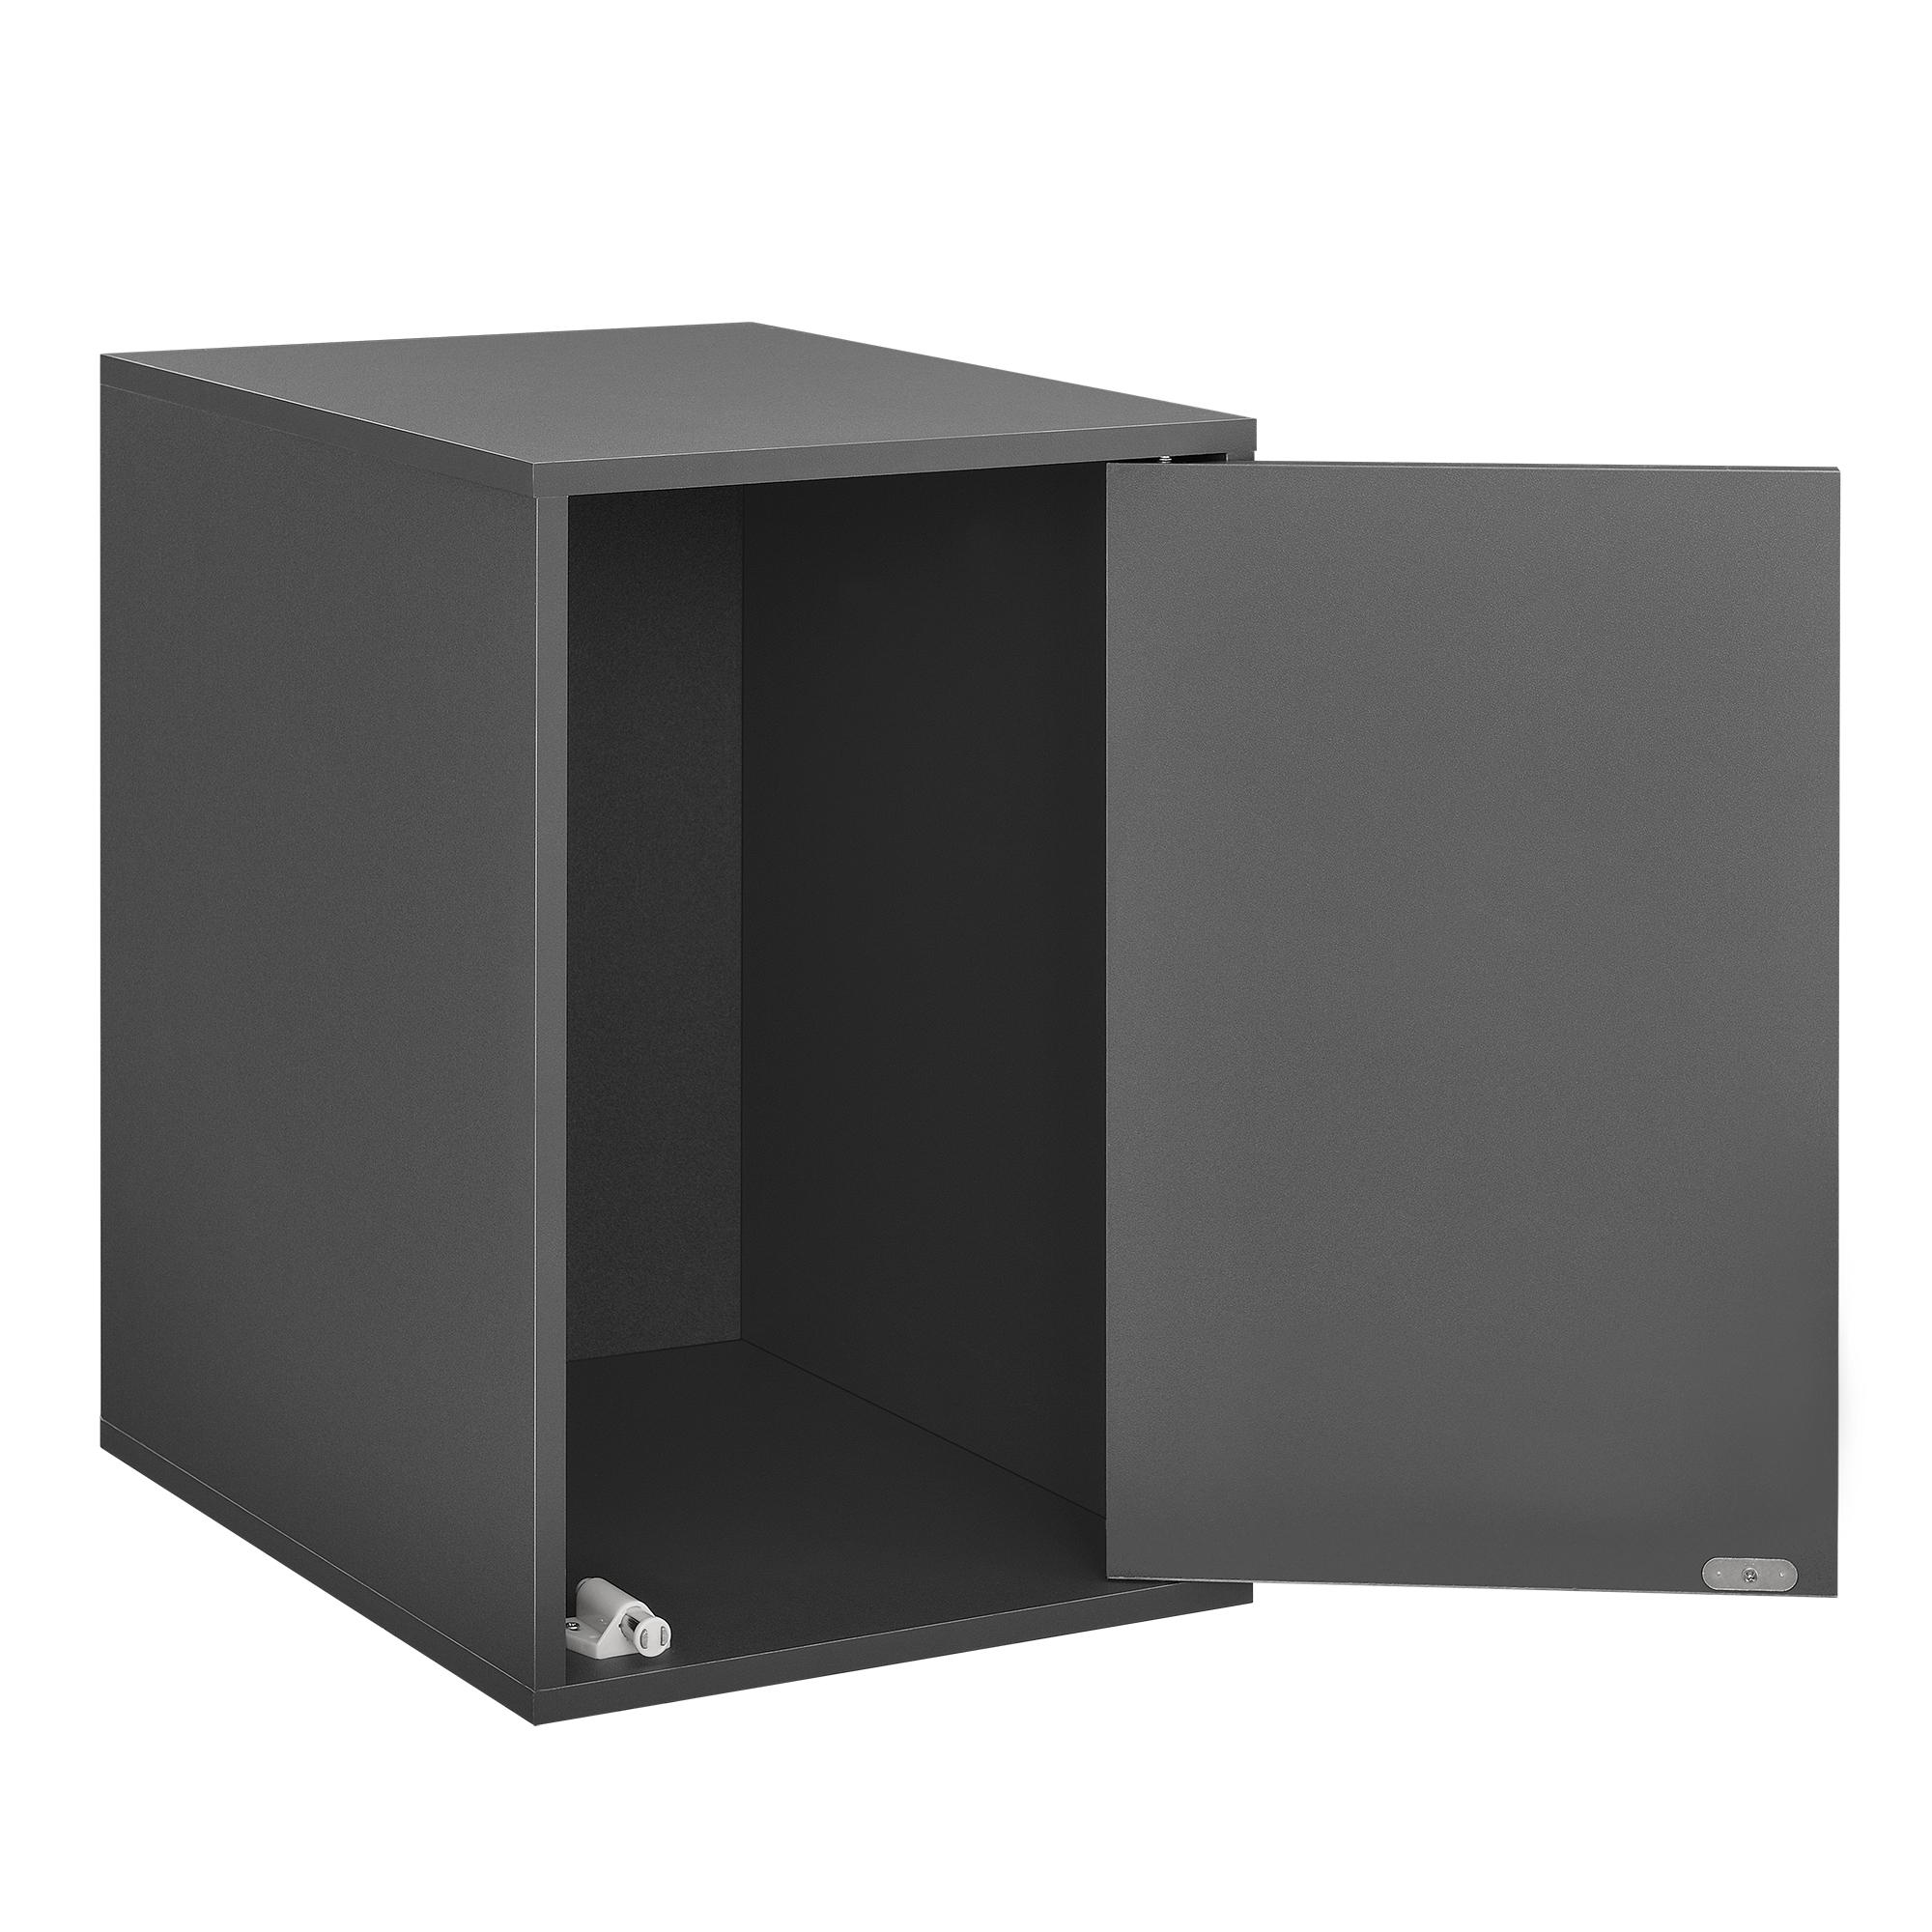 h ngeschrank 30x45x40cm grau wandschrank schrank wandregal regal ebay. Black Bedroom Furniture Sets. Home Design Ideas